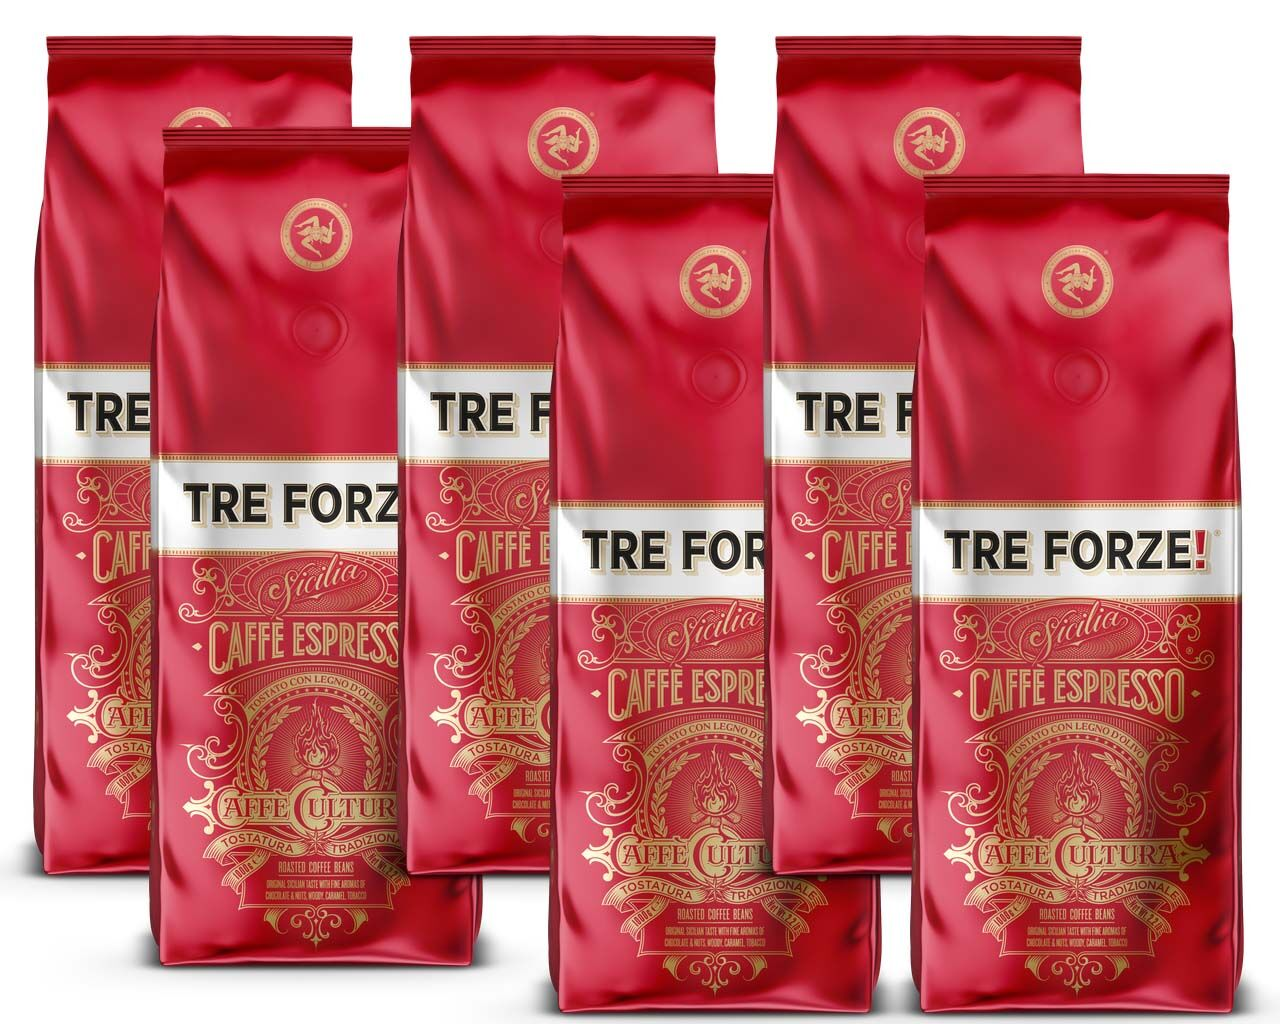 Tre Forze! Espresso Caffè 6 x 1000g Bohne Set